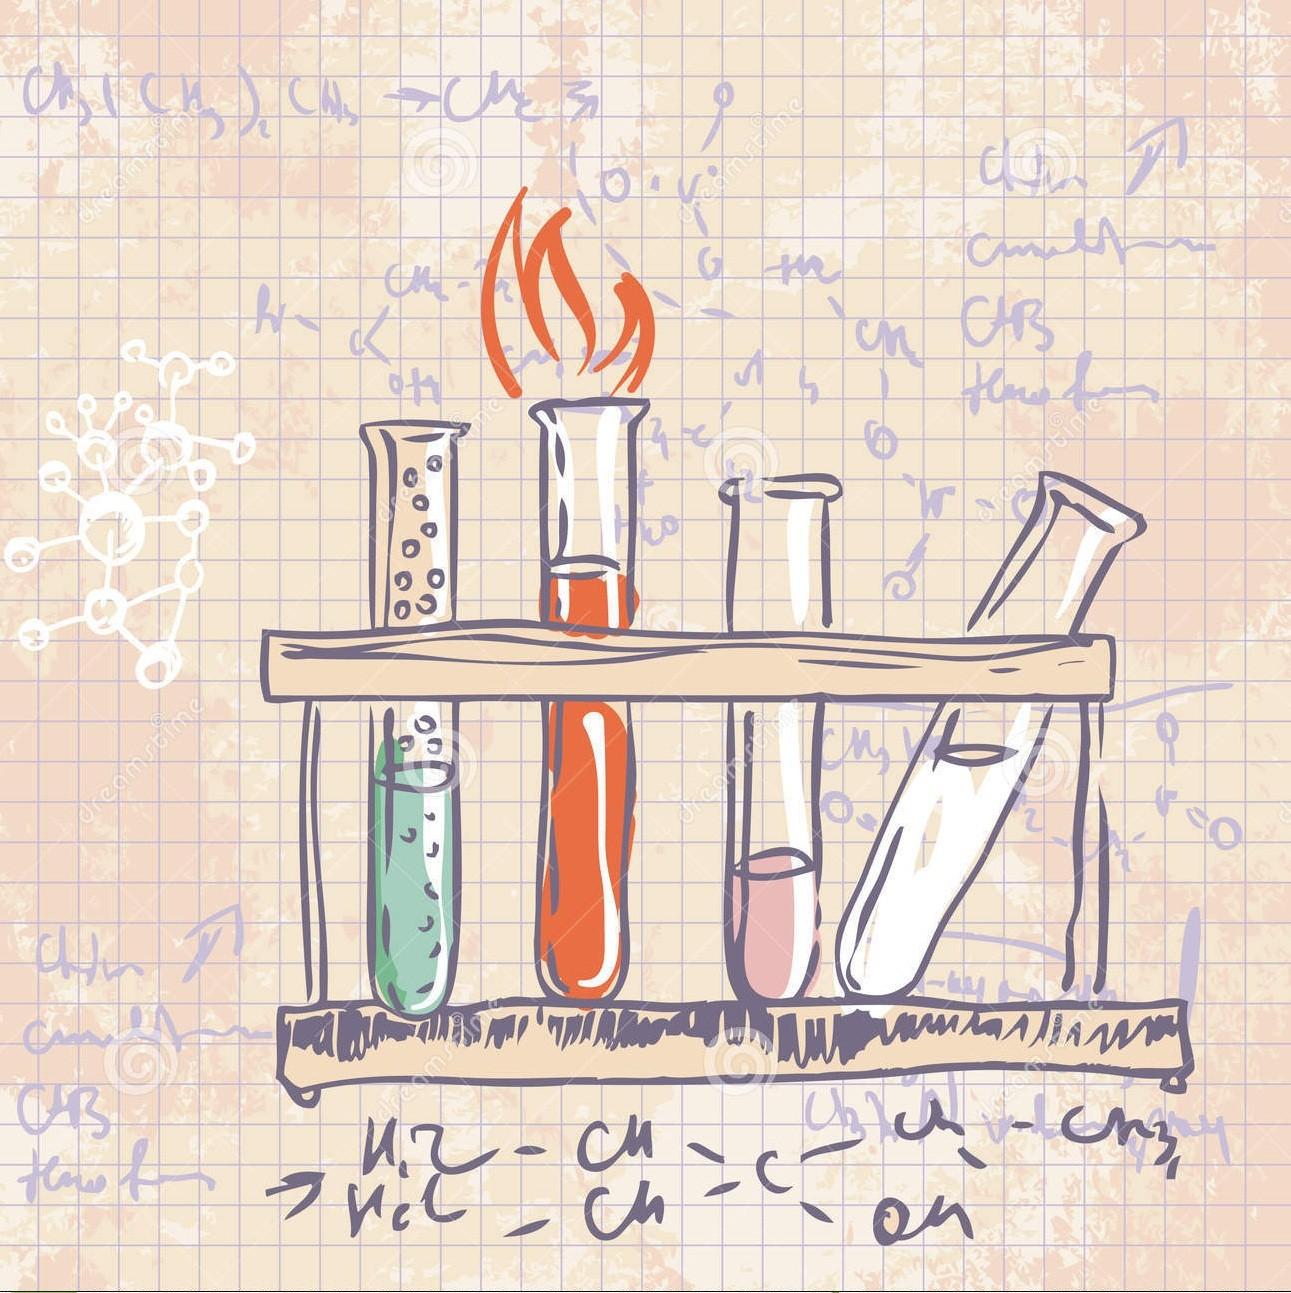 old-chemistry-laboratory-background-28250168